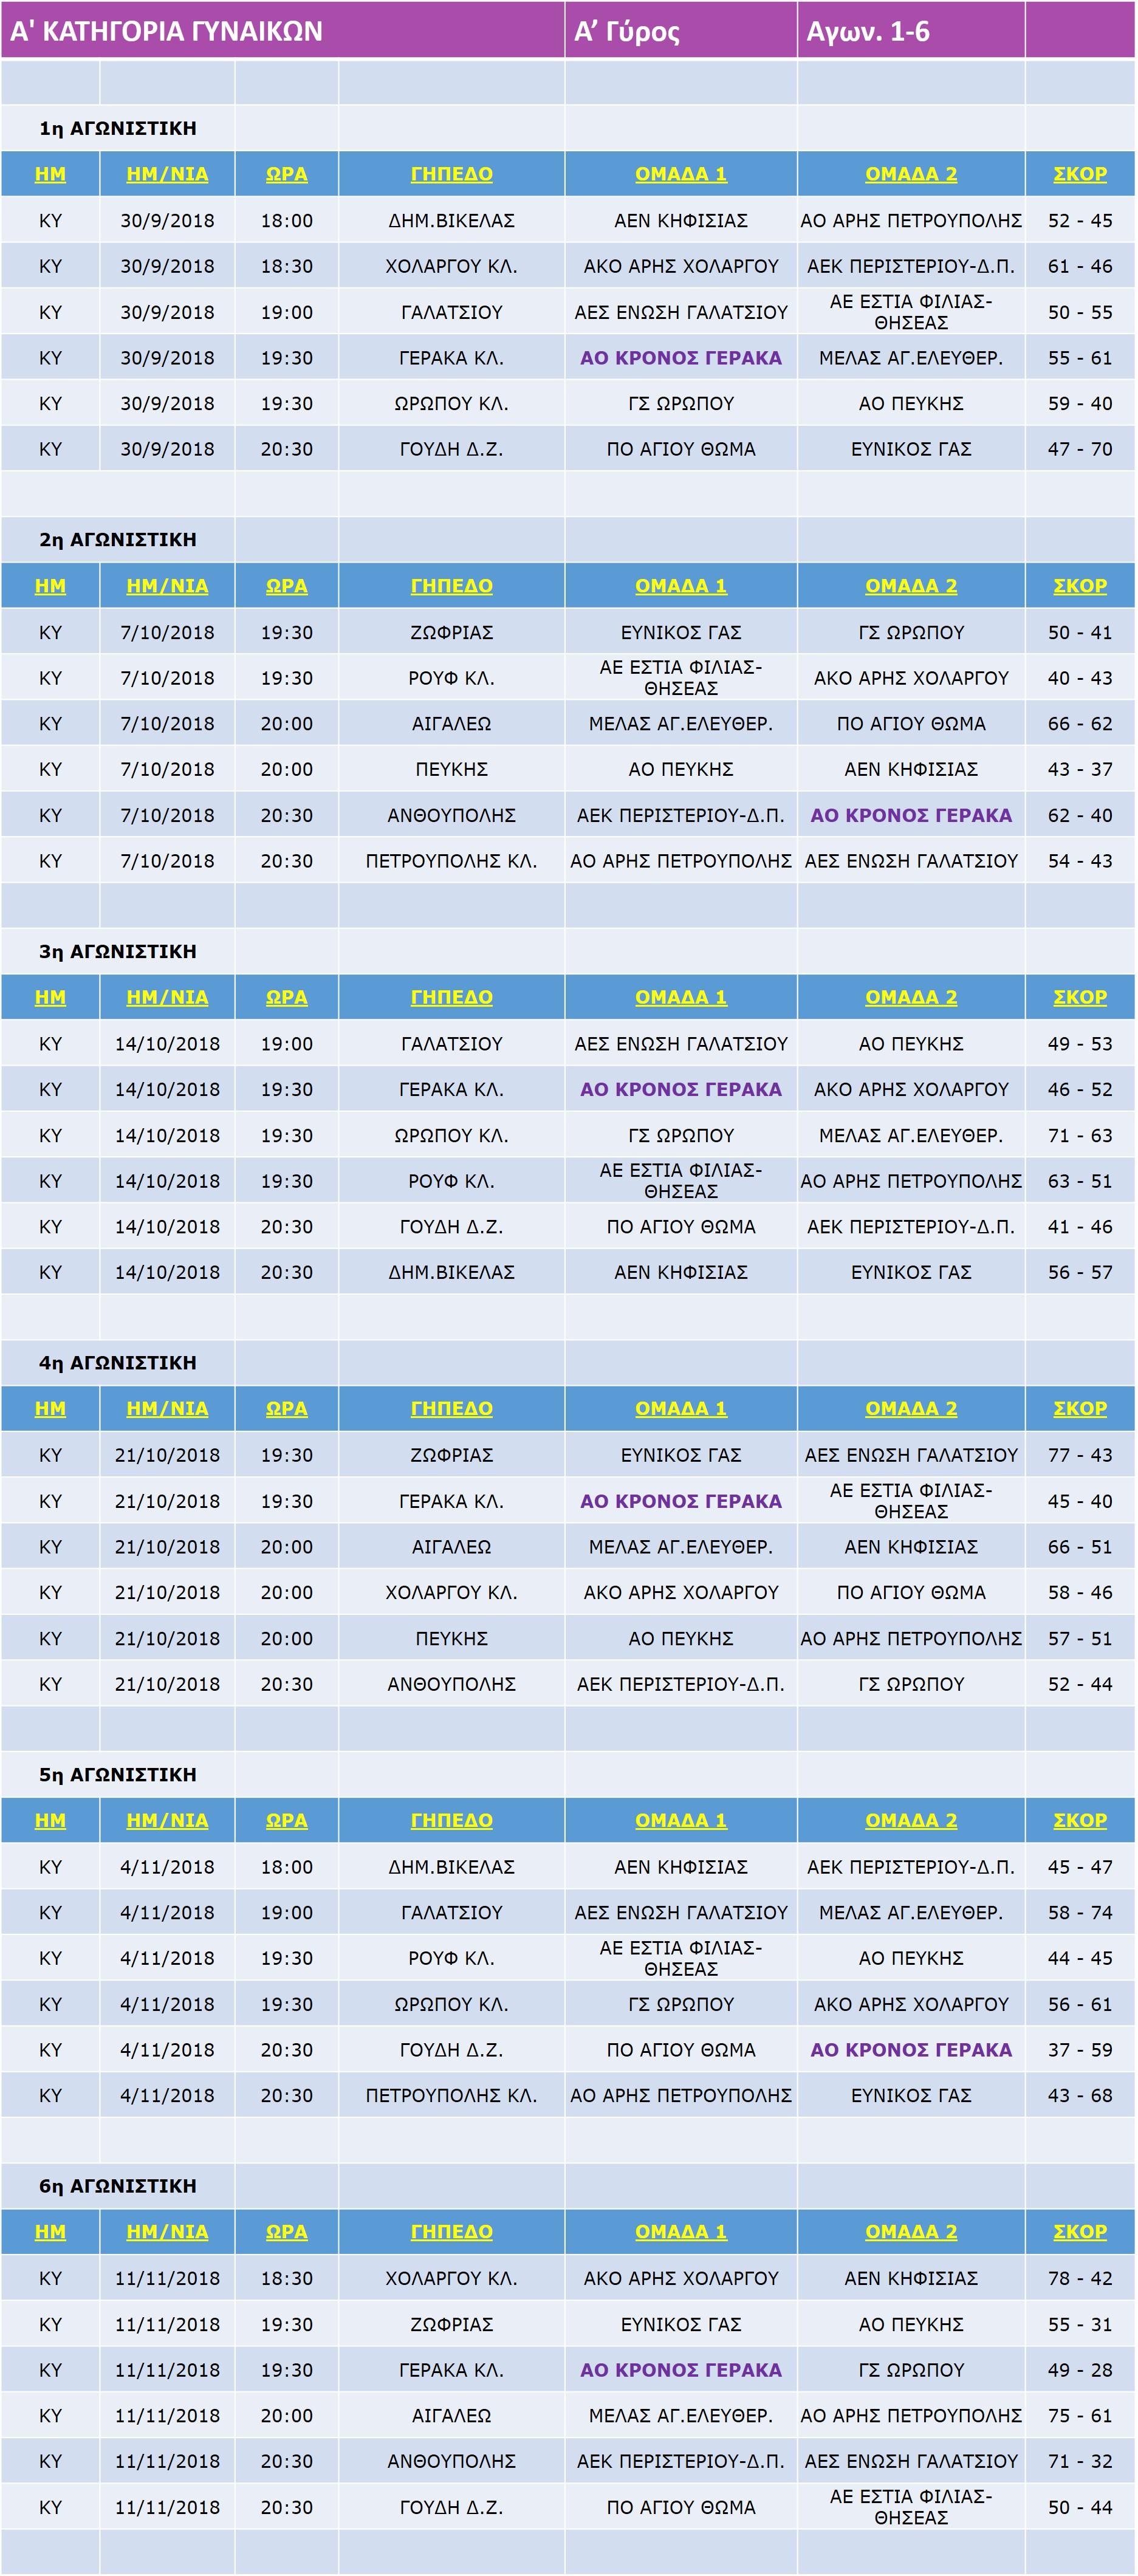 Gynaikes_Match_1-6-6